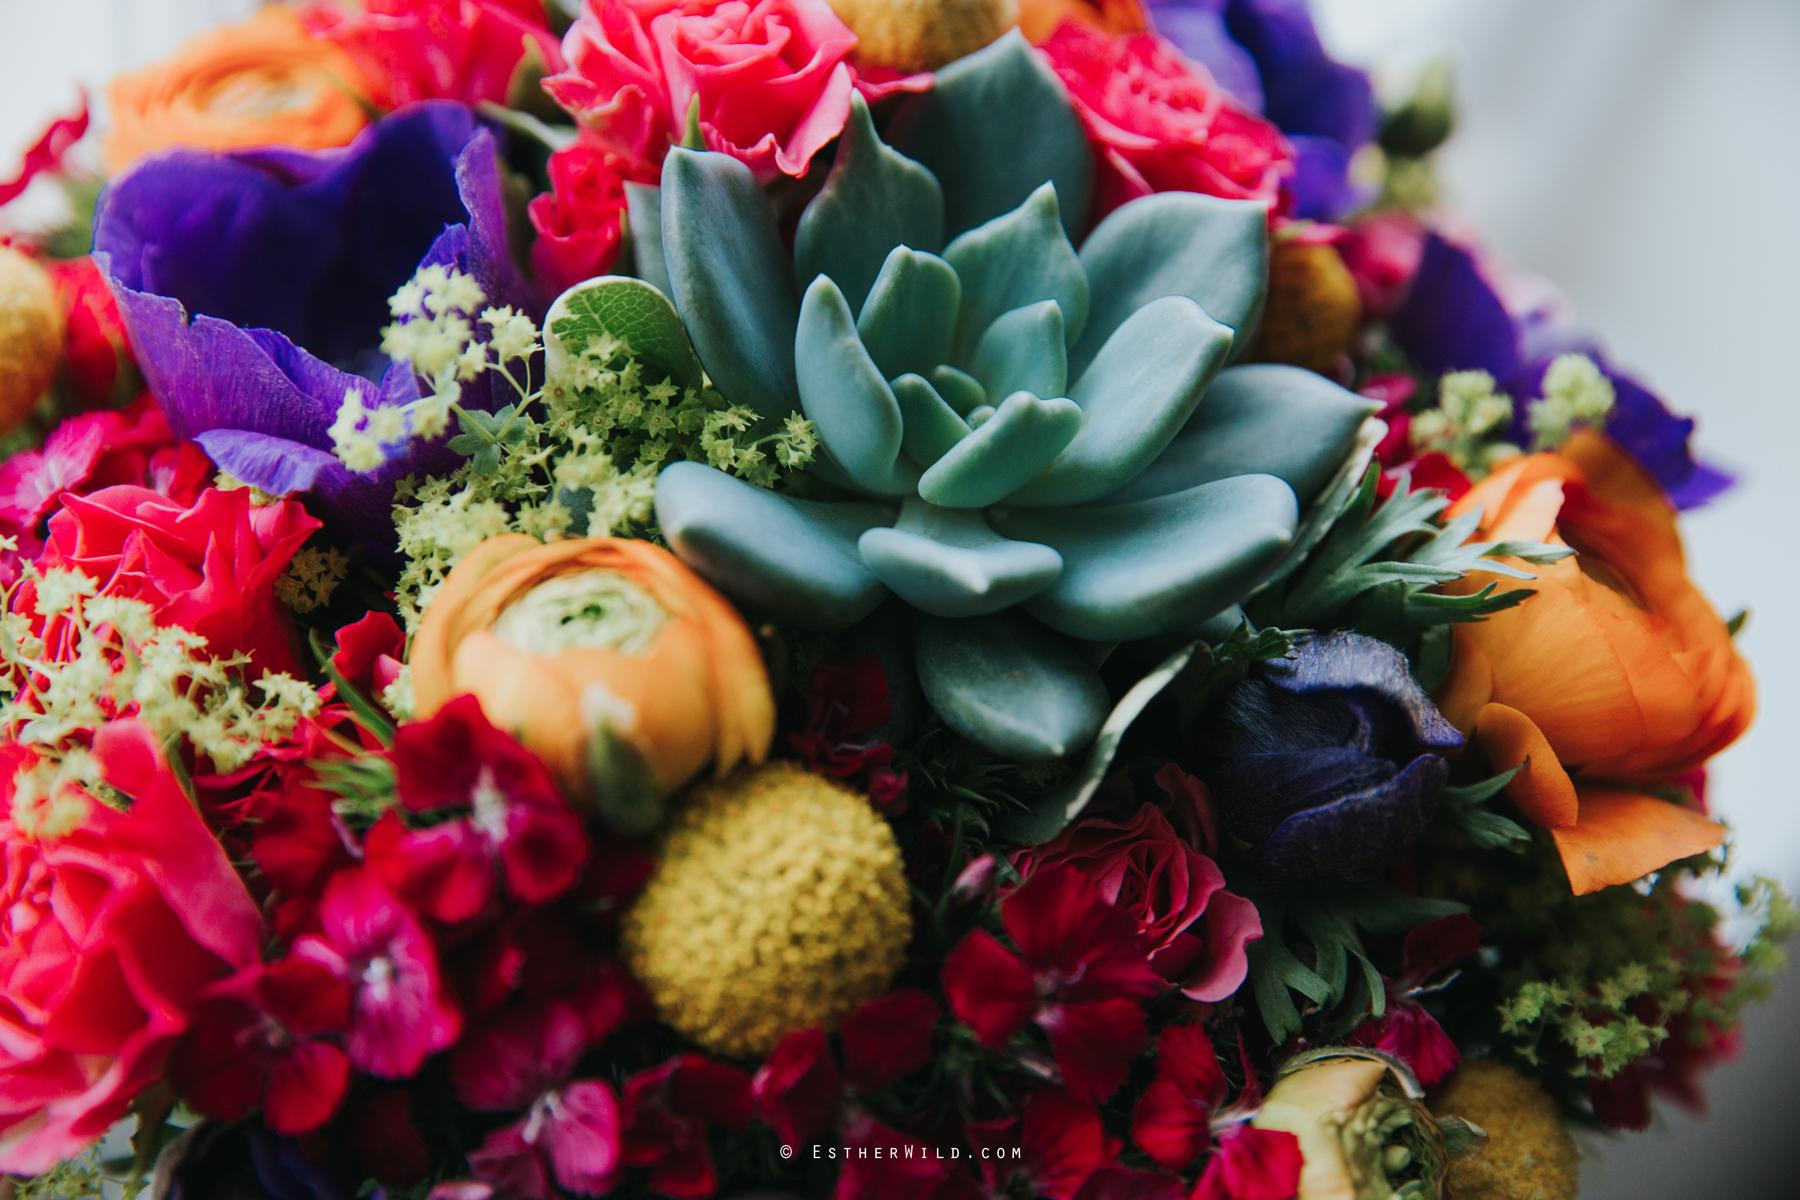 The_BoatHouse_Wedding_Venue_Ormesby_Norfolk_Broads_Boat_Wedding_Photography_Esther_Wild_Photographer_IMG_0327.jpg